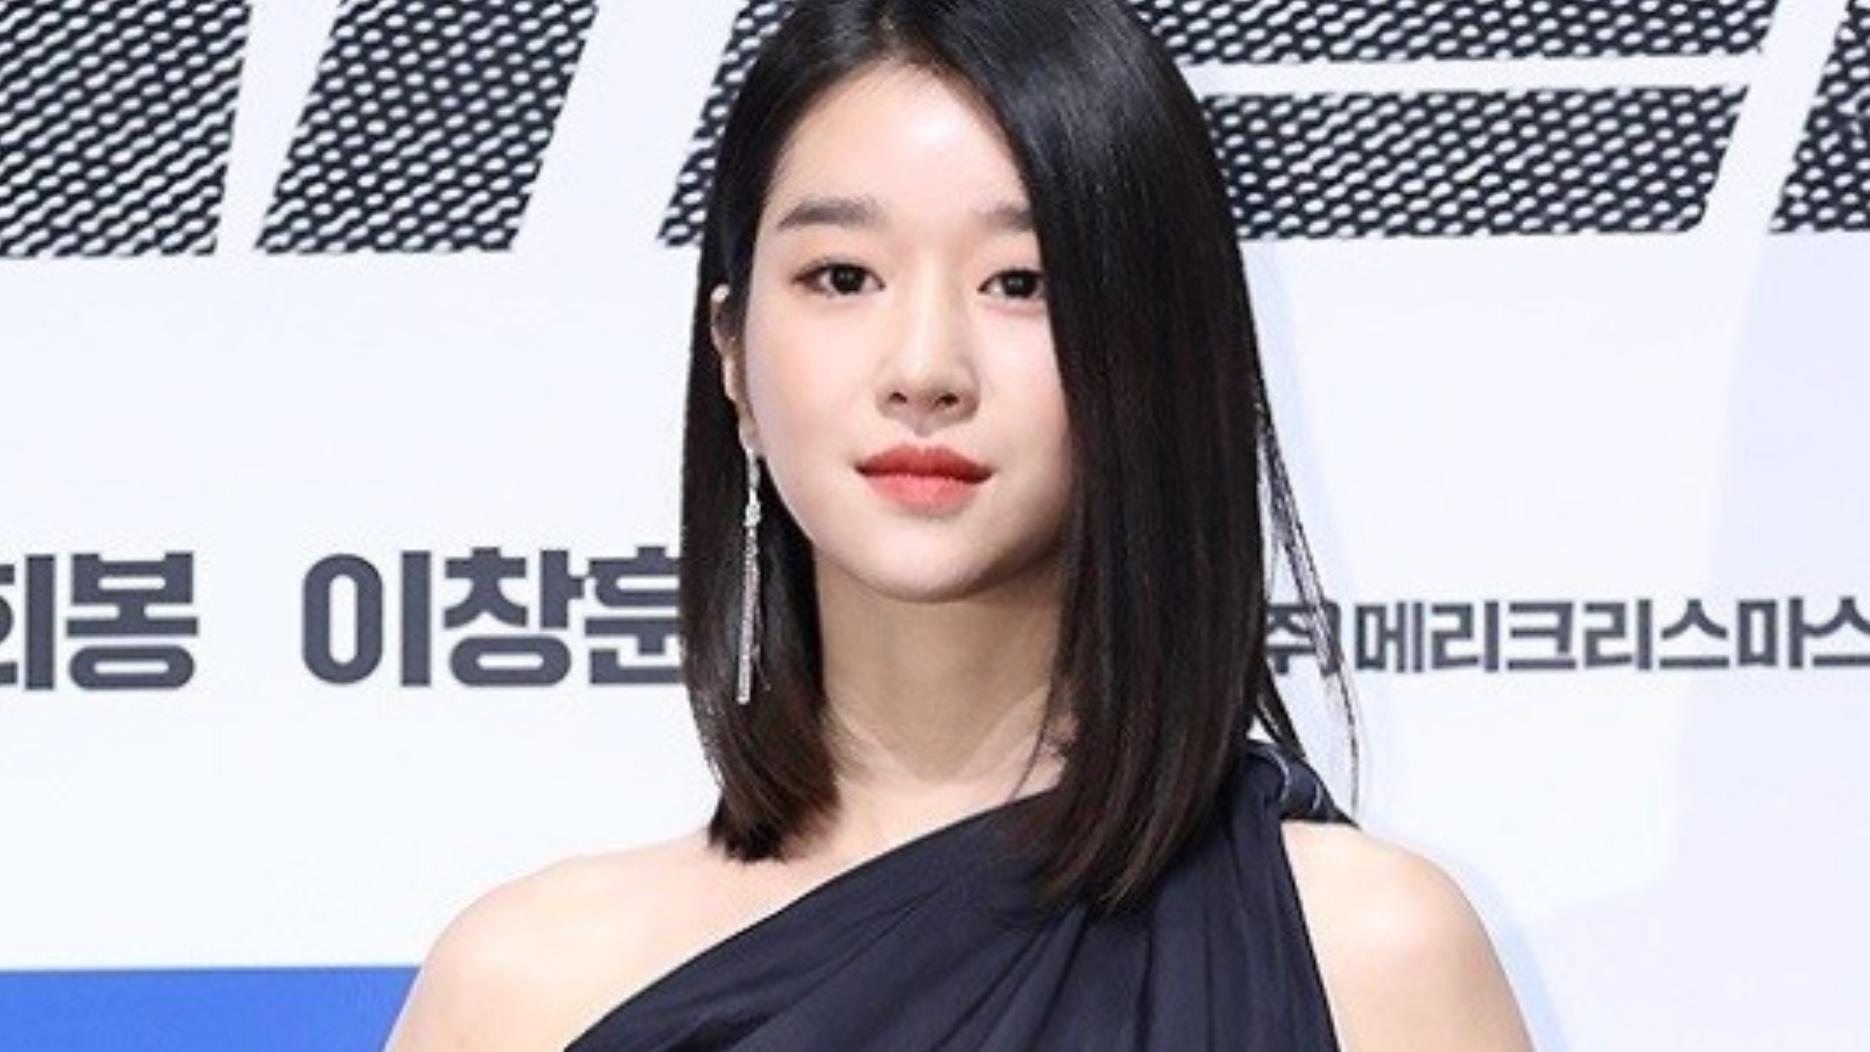 Jin seo ye Netizens speculate